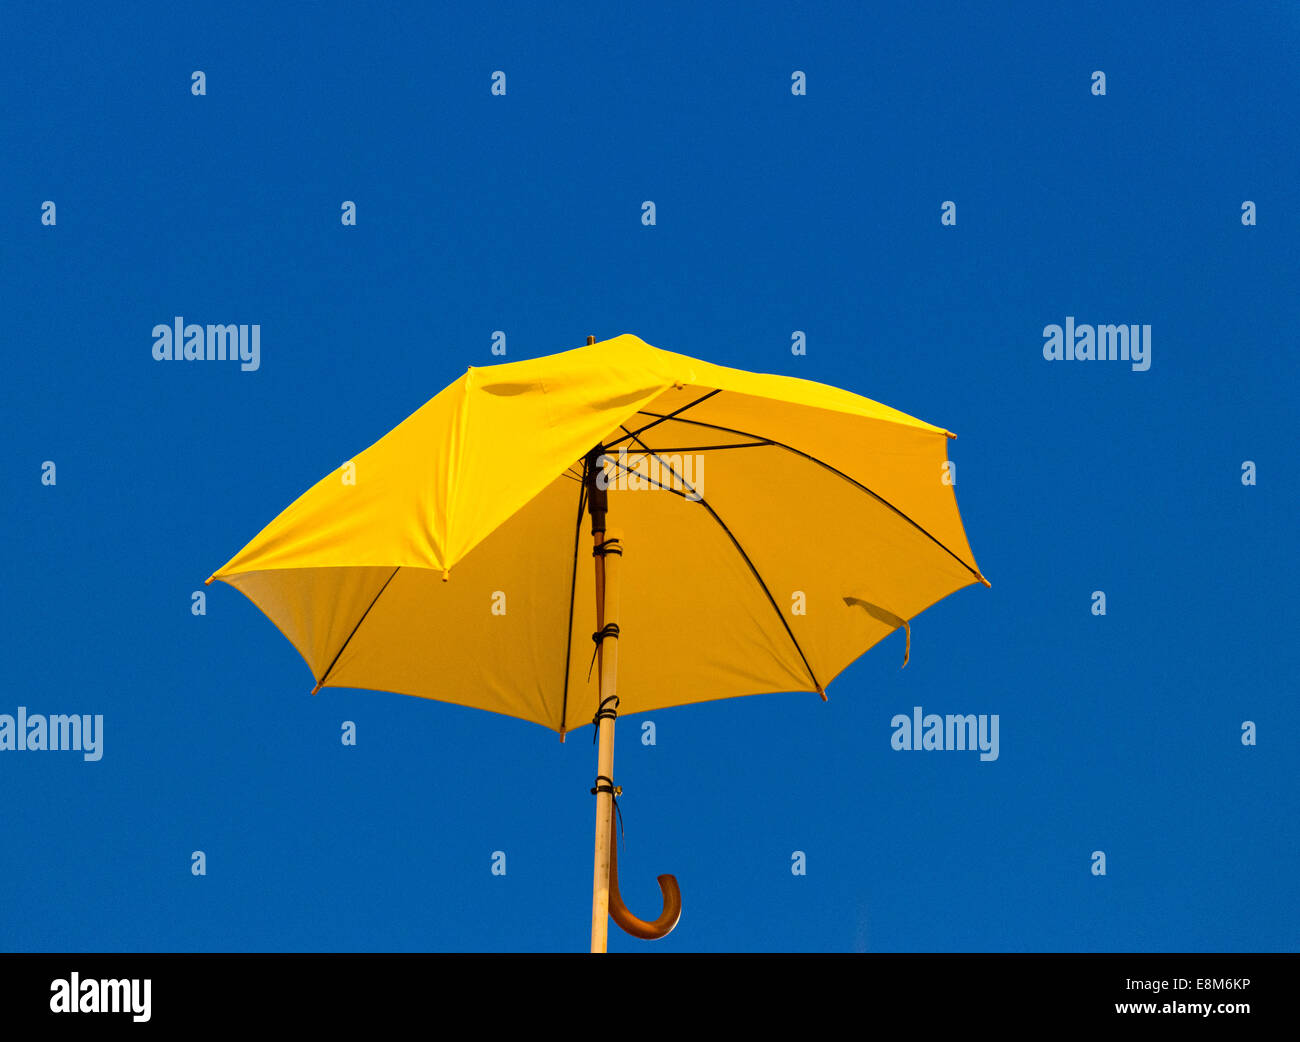 October 10 2014 Hong Kong  Yellow umbrella - Stock Image